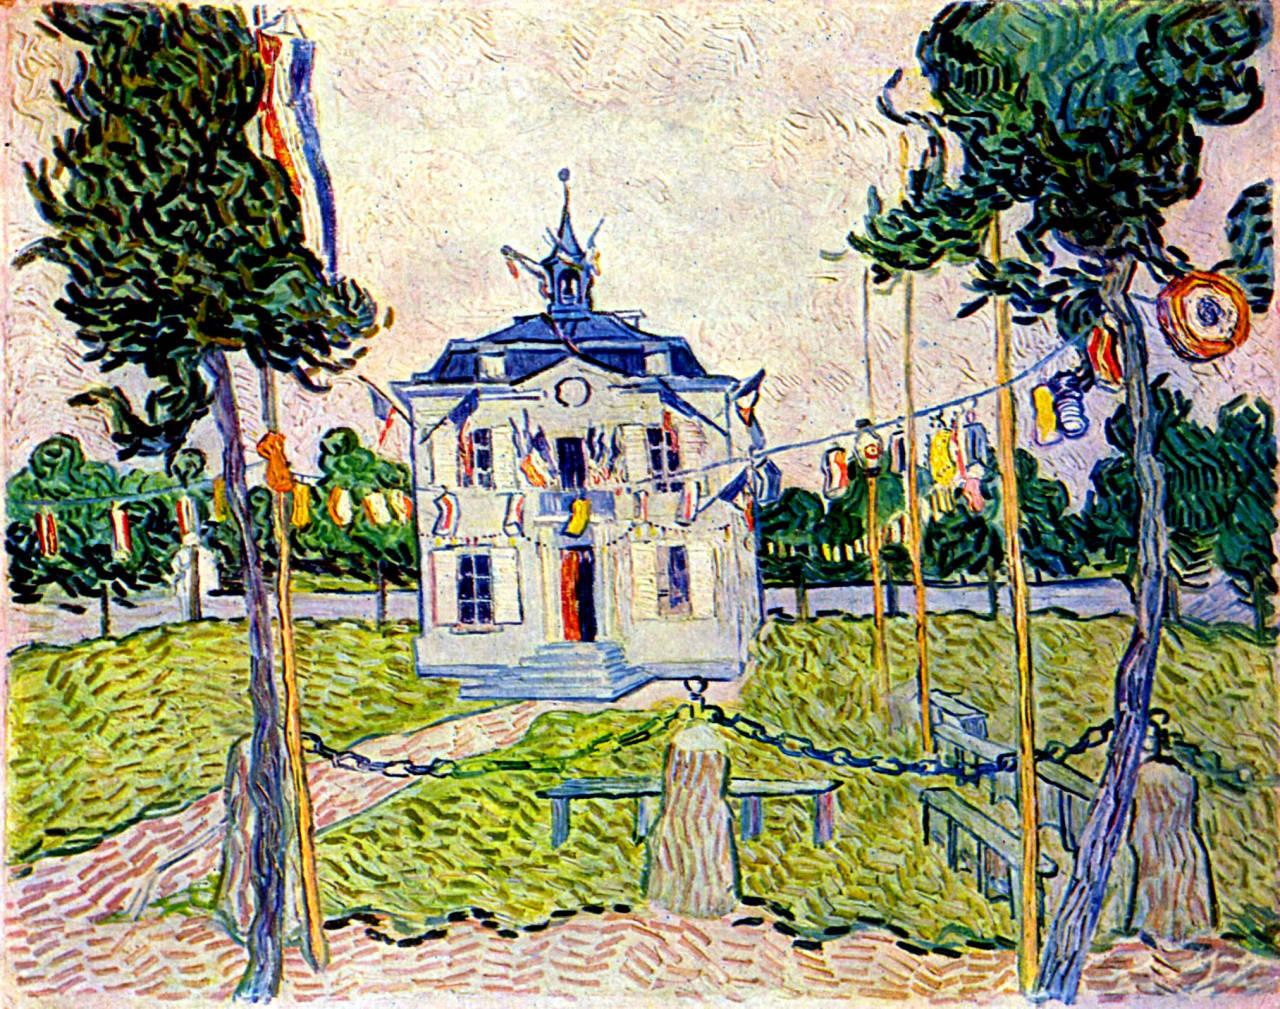 vincentvangogh-art:Auvers Town Hall in 14 July 1890, 1890 Vincent van Gogh